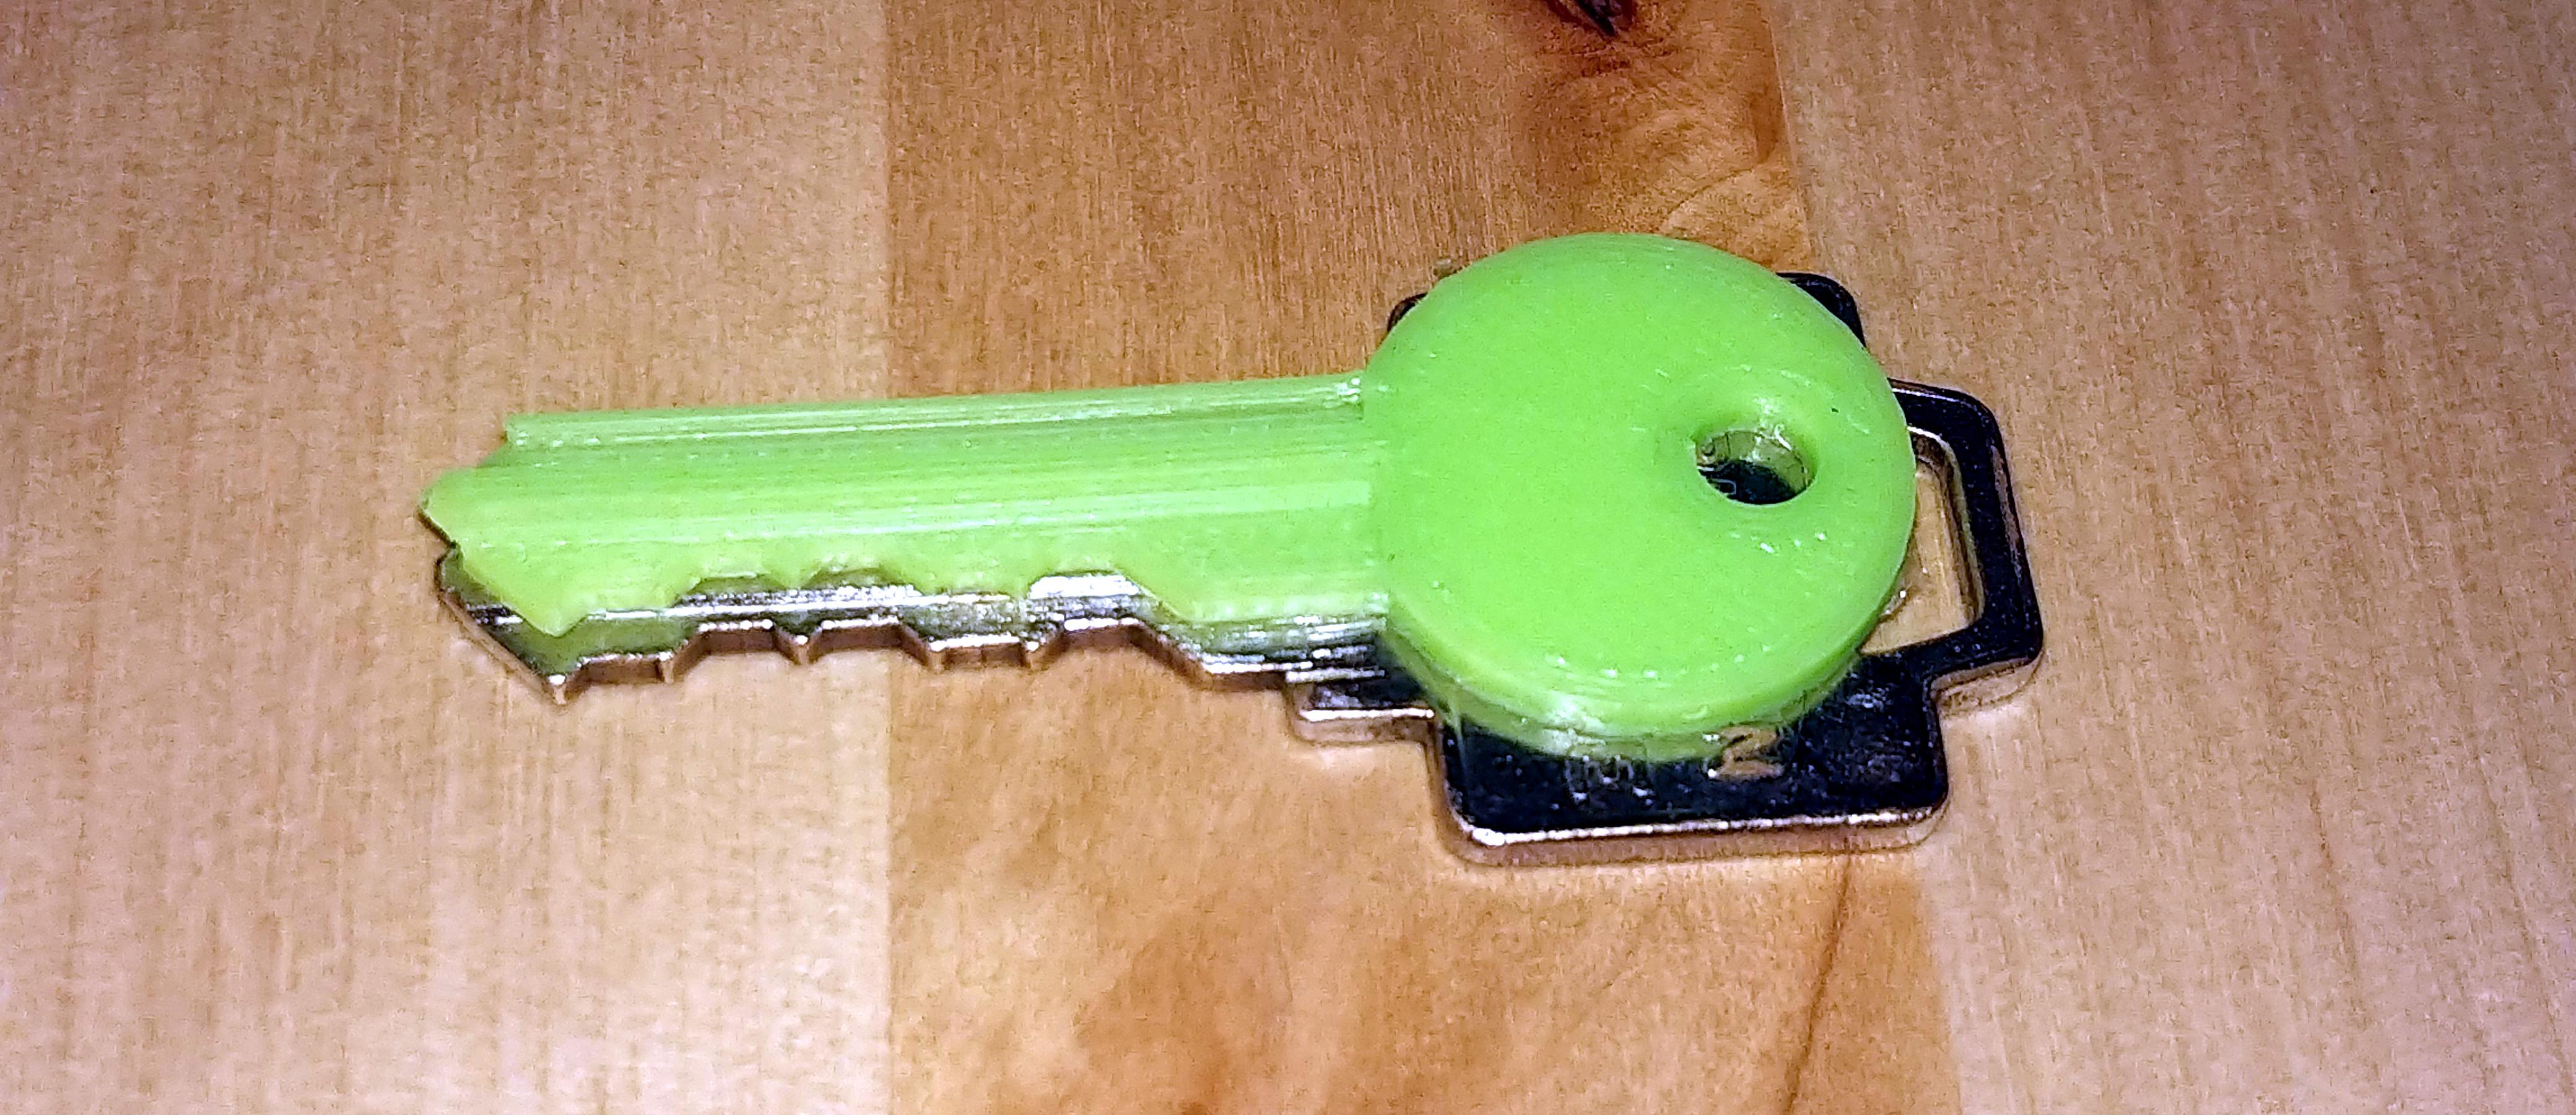 3D-Printed Kwikset Keys Parametrically | Hackaday